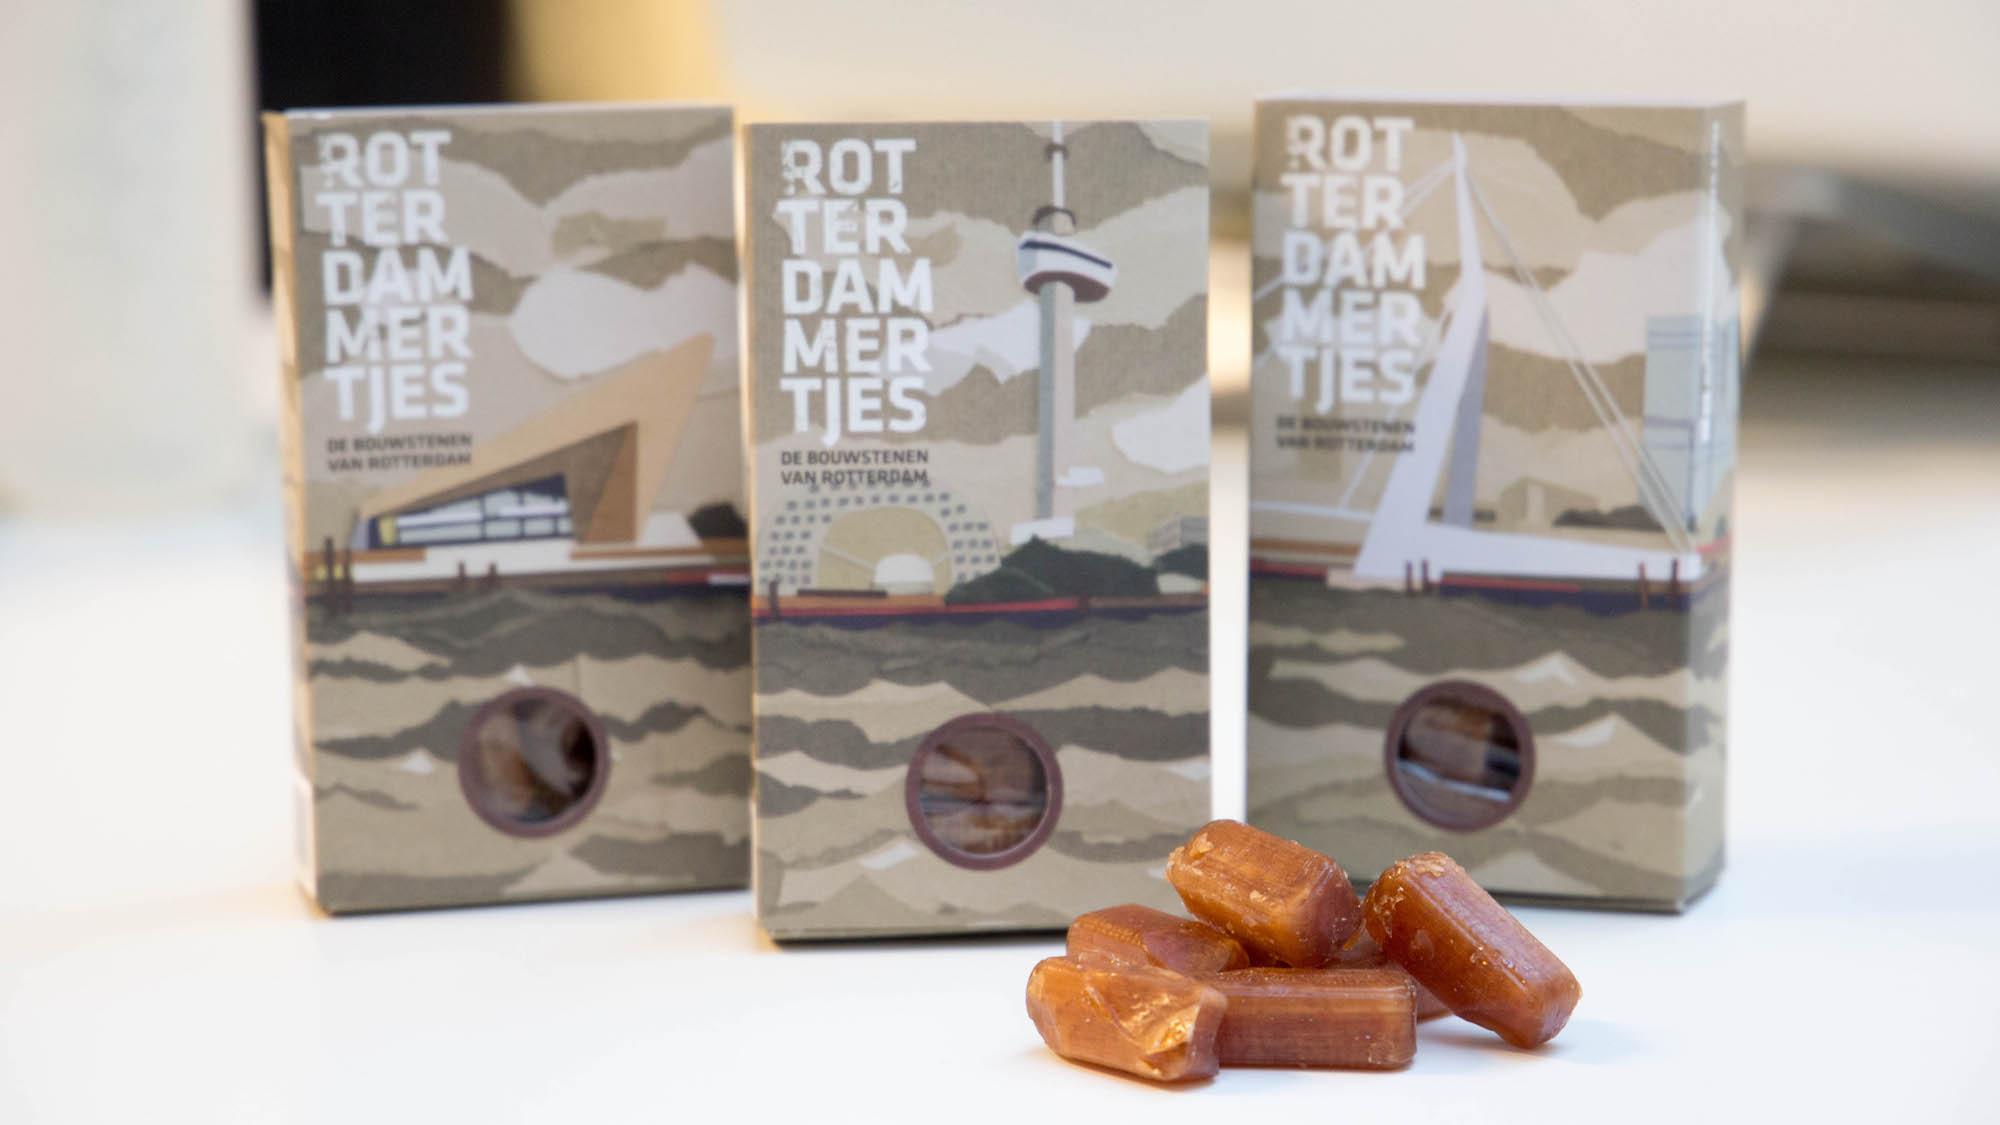 Rotterdammertjes - Rotterdams snoep